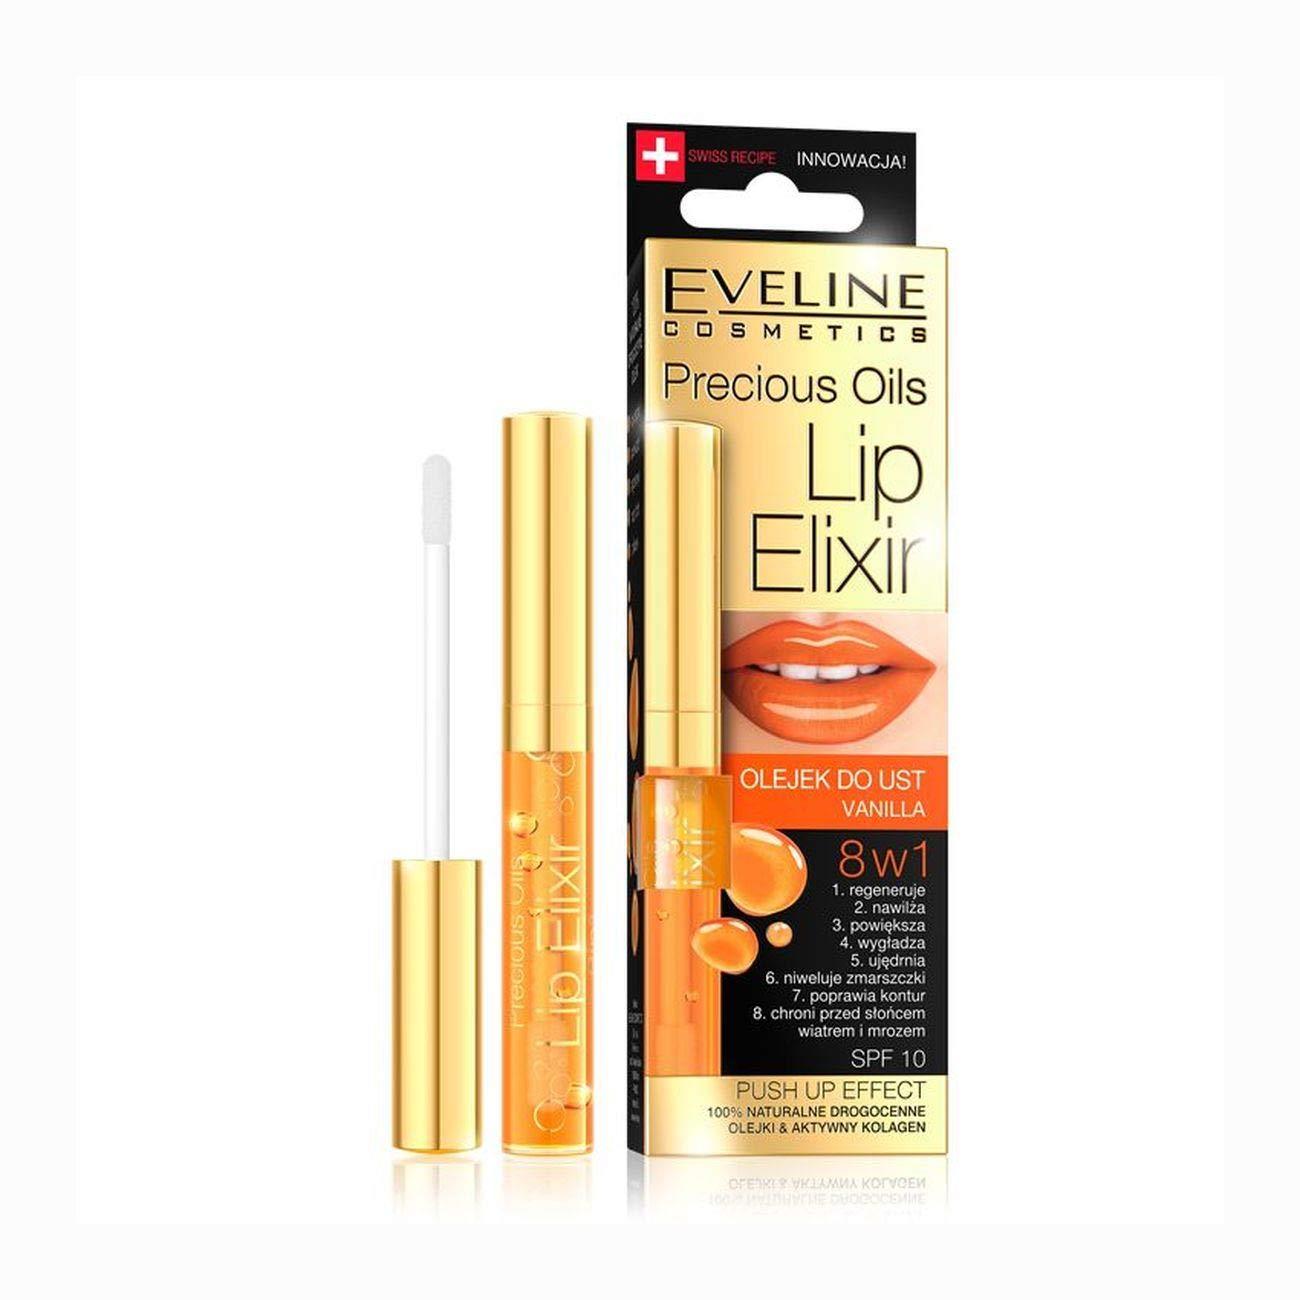 Eveline Cosmetics Lip Elixir 8-in-1 Push-Up Effect SPF10 Vanilla 7ml